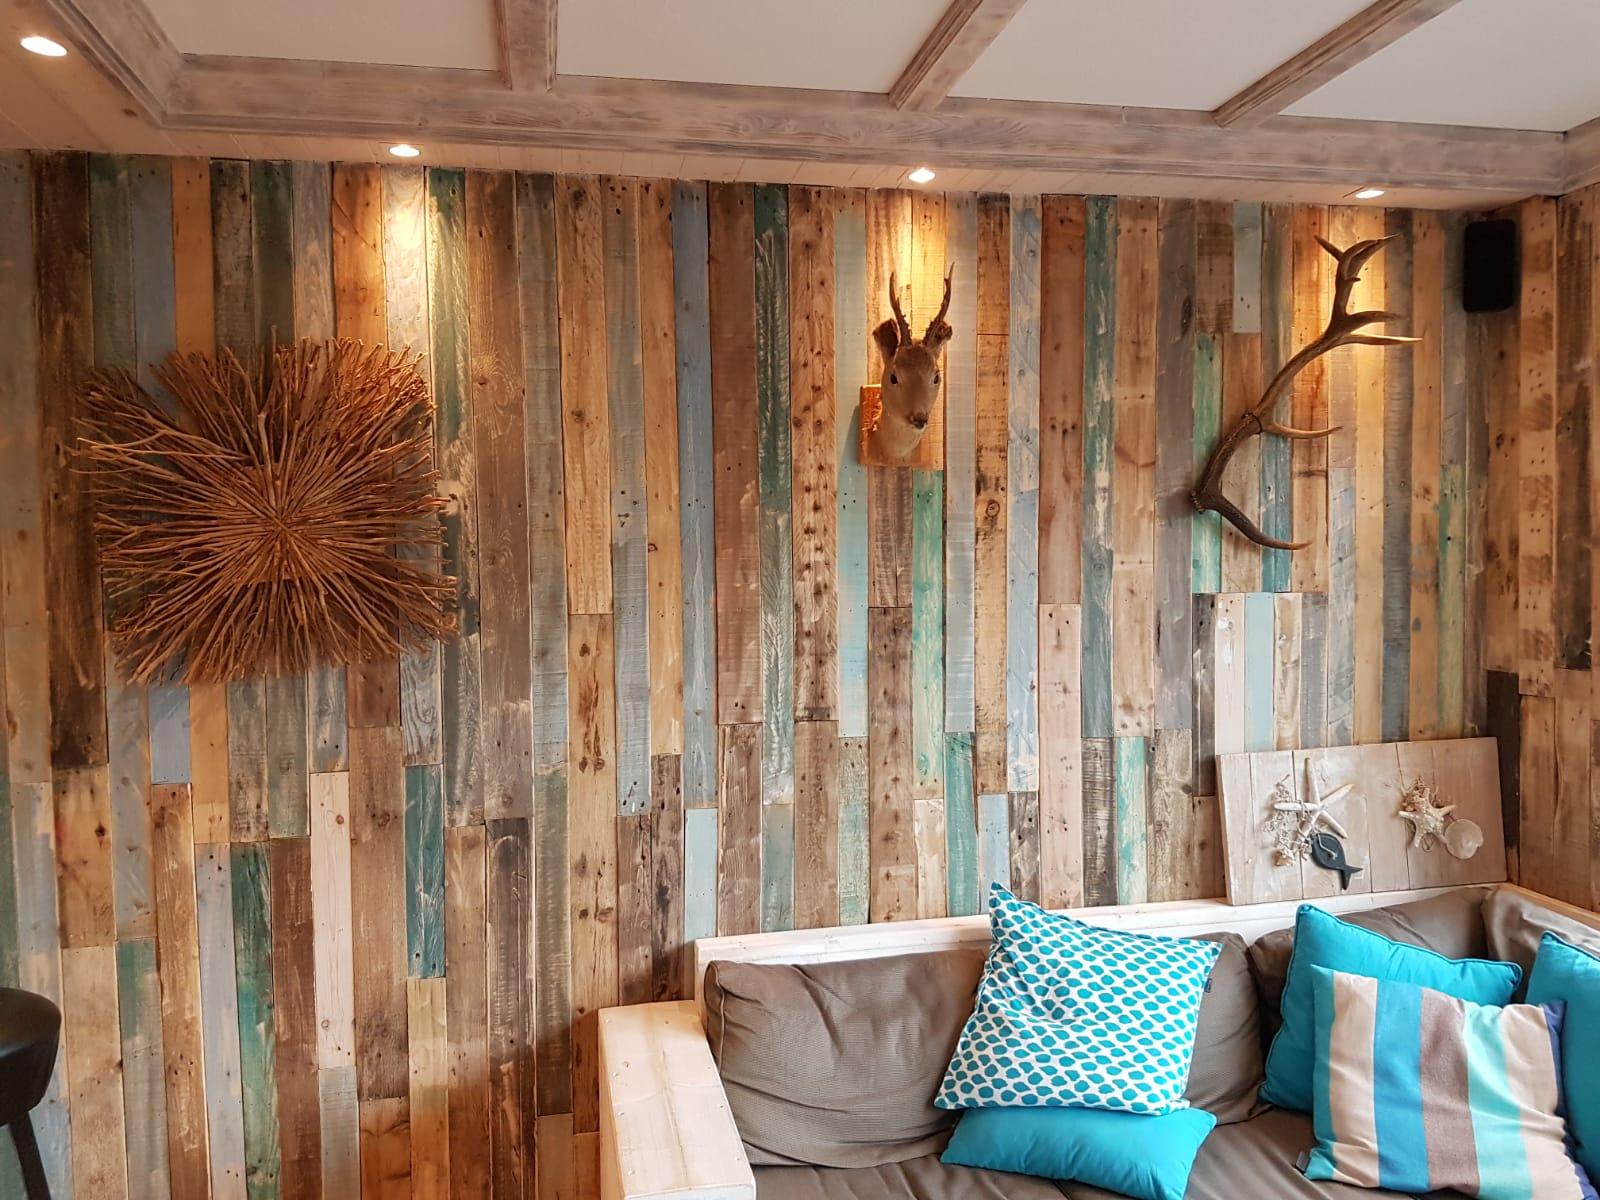 Woodindustries wandbekleding steigerhout